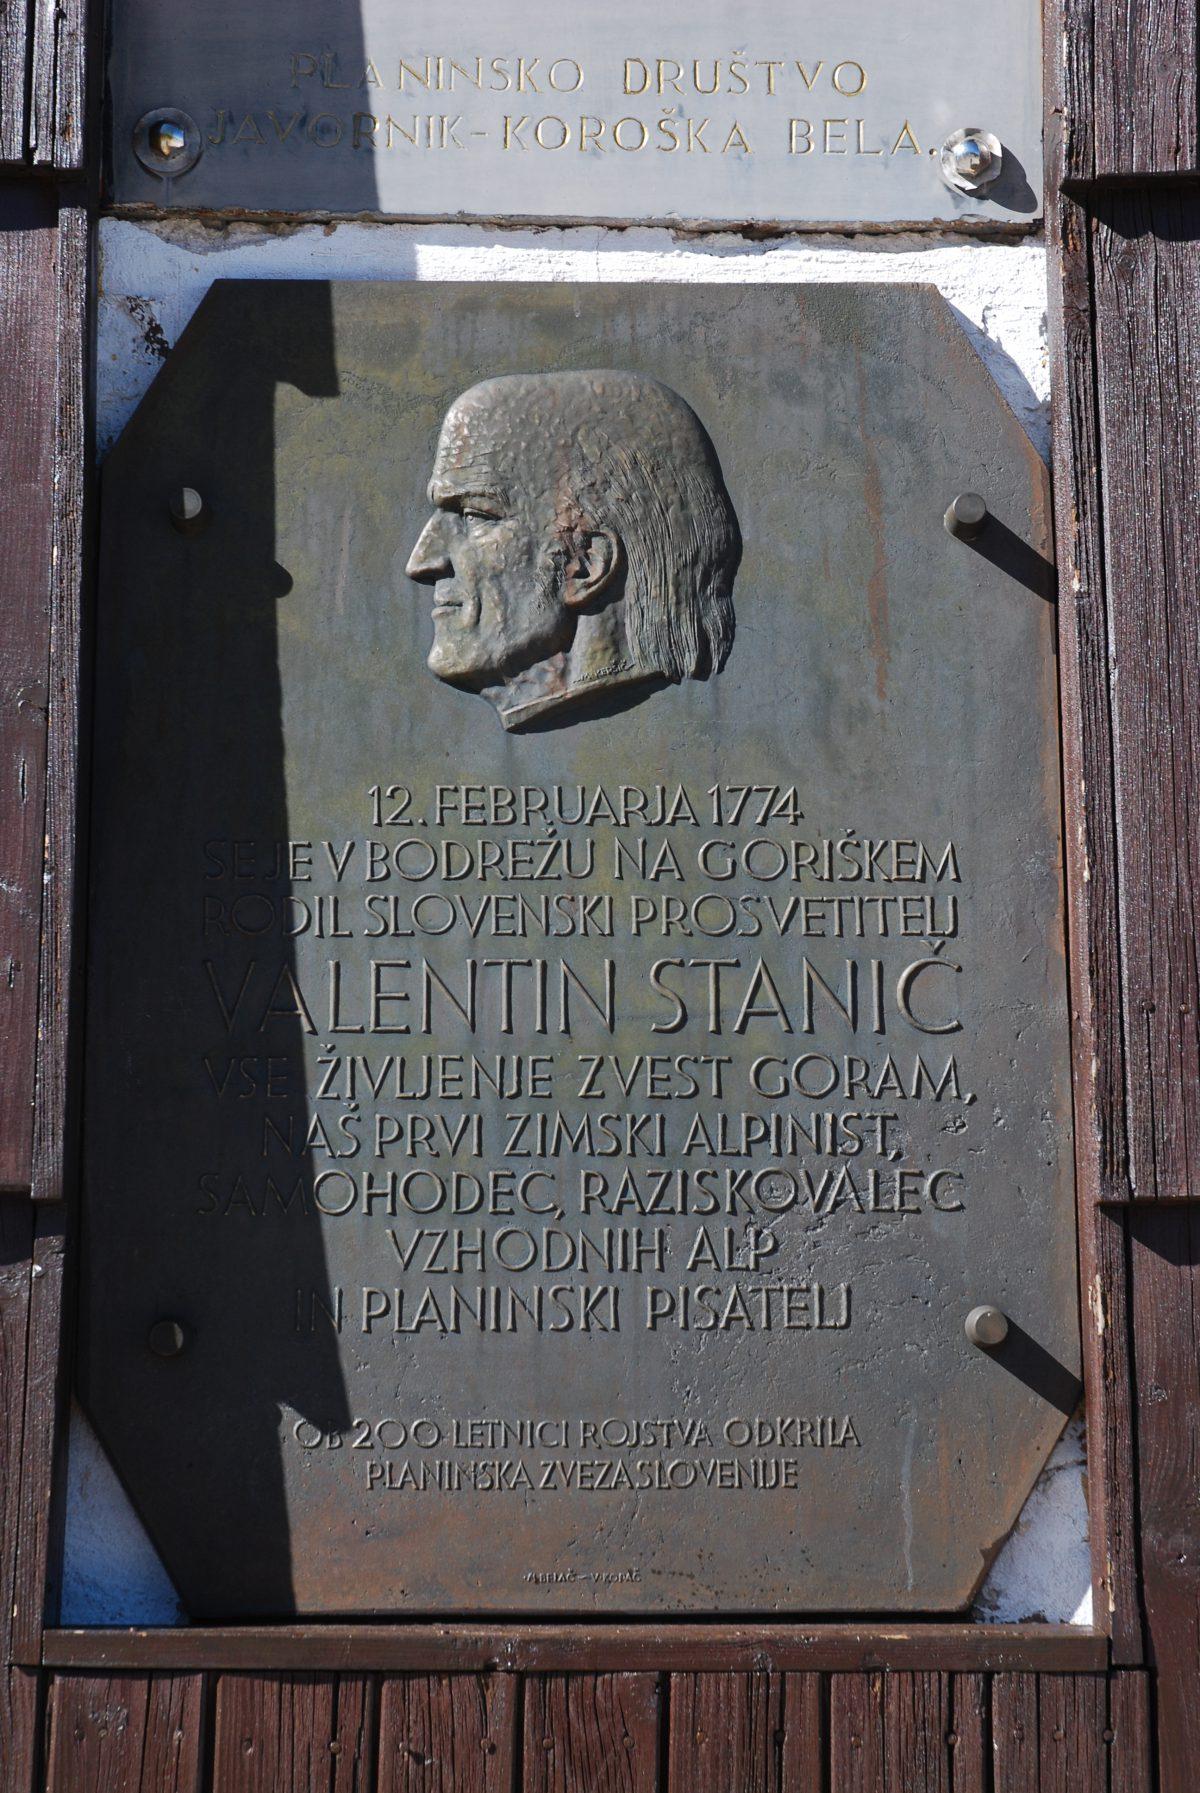 VALENTIN STANIC